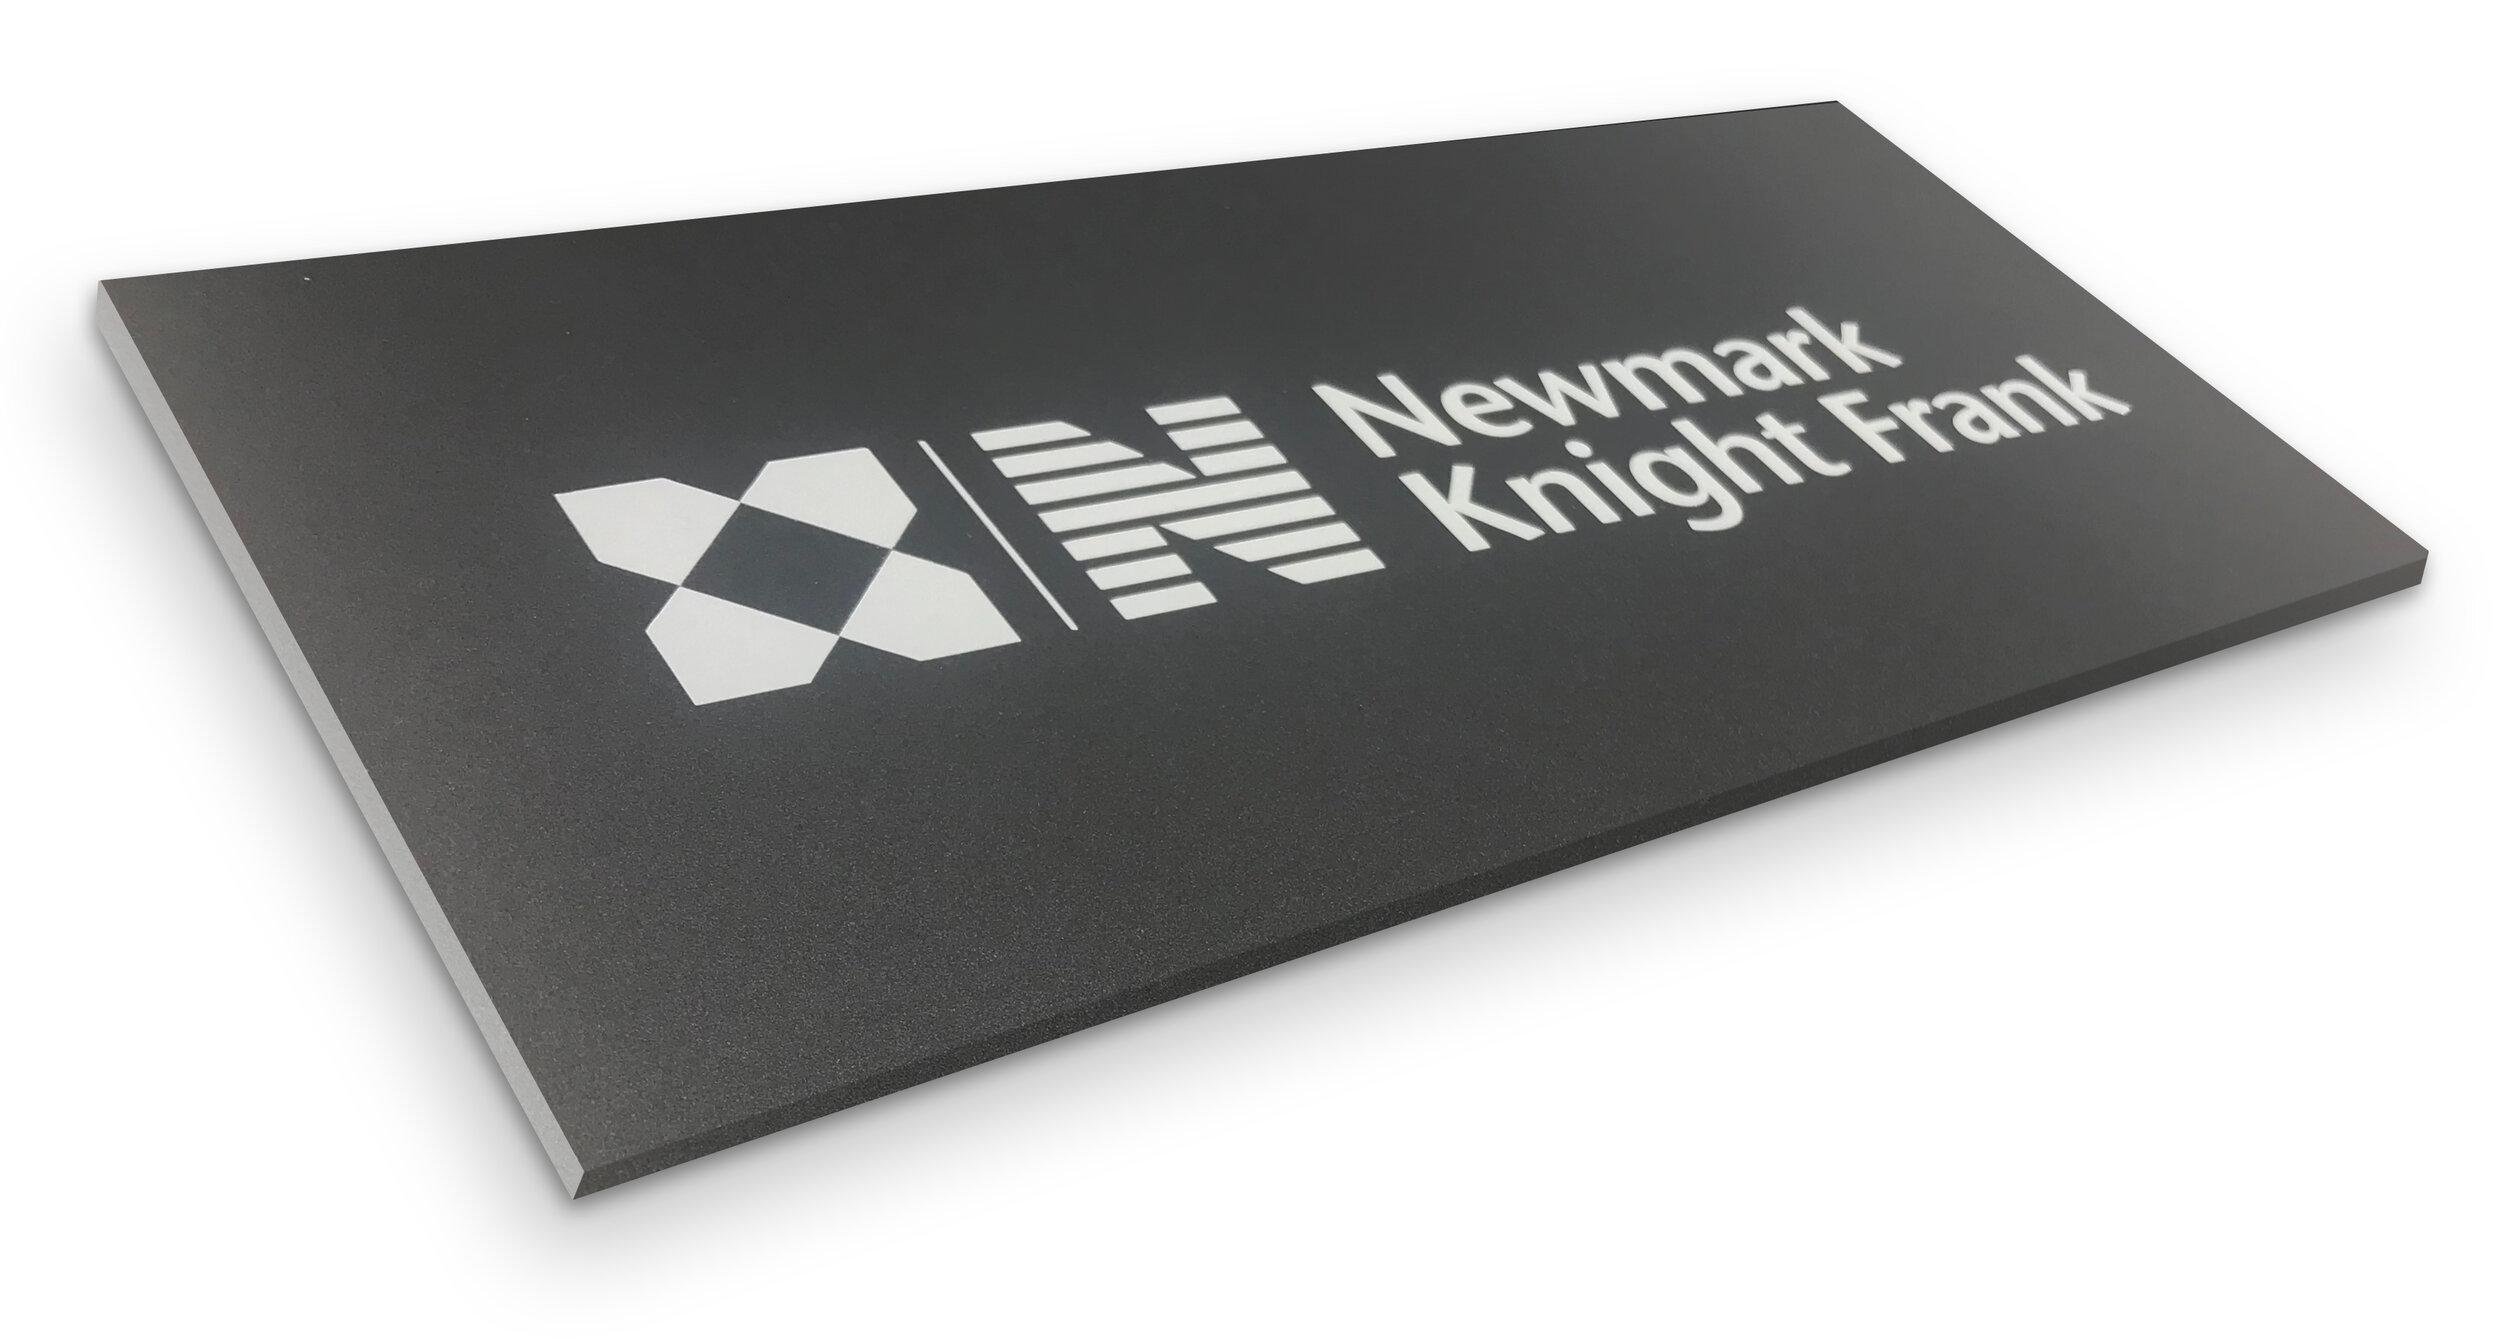 Steel Art Newmark Knight Frank Etching.jpg